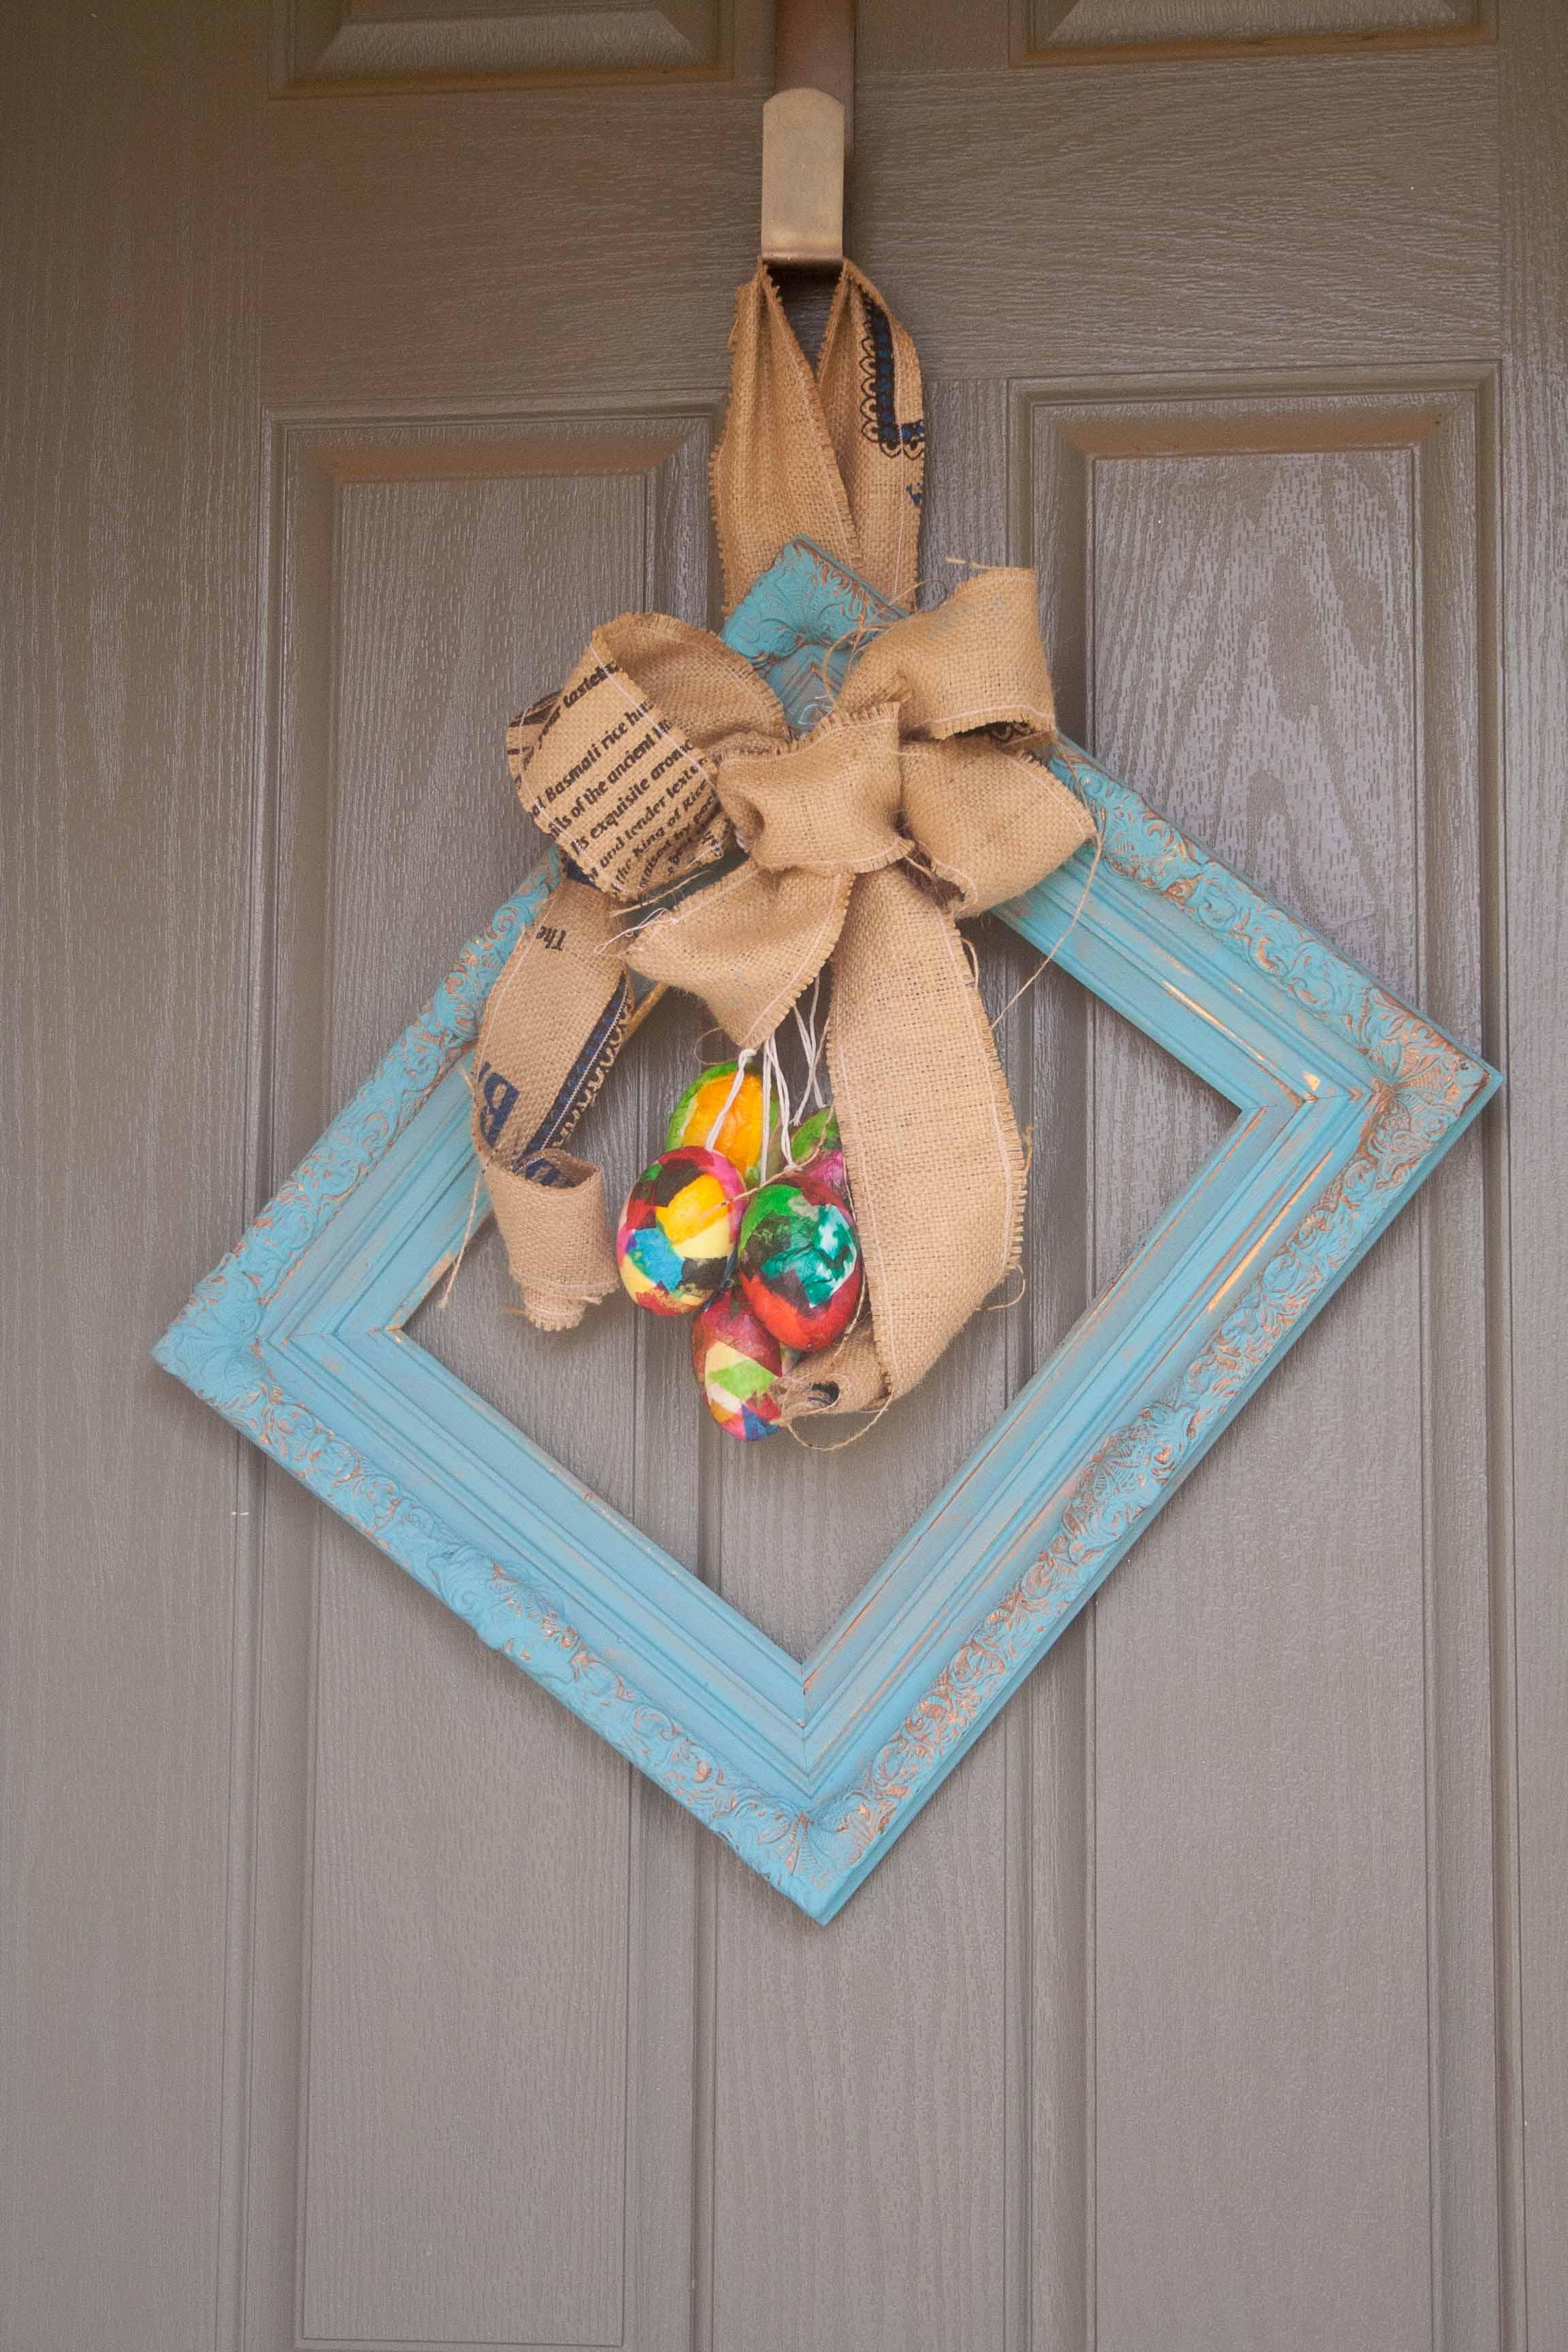 Easy Front Door Decorations Diy Deco Mommy Hobbies,Low Maintenance Backyard Landscaping Small Garden Ideas No Grass